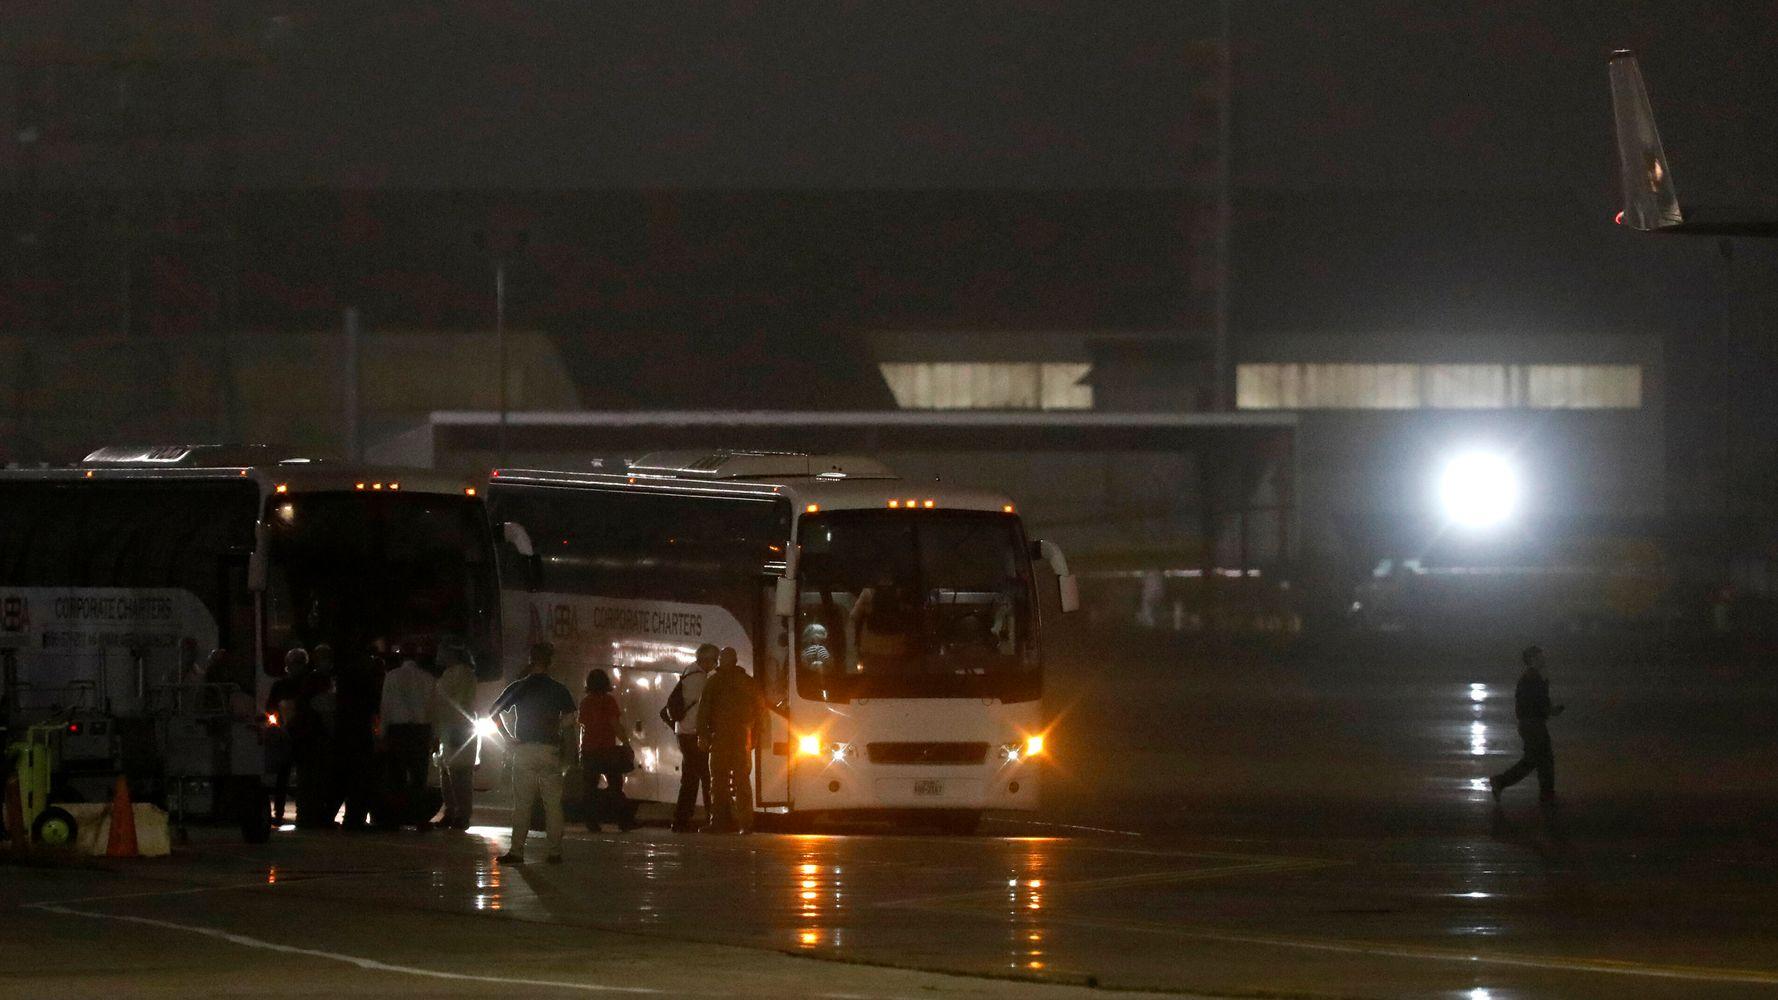 14 People Evacuated To U.S. From Japan Test Positive For Coronavirus